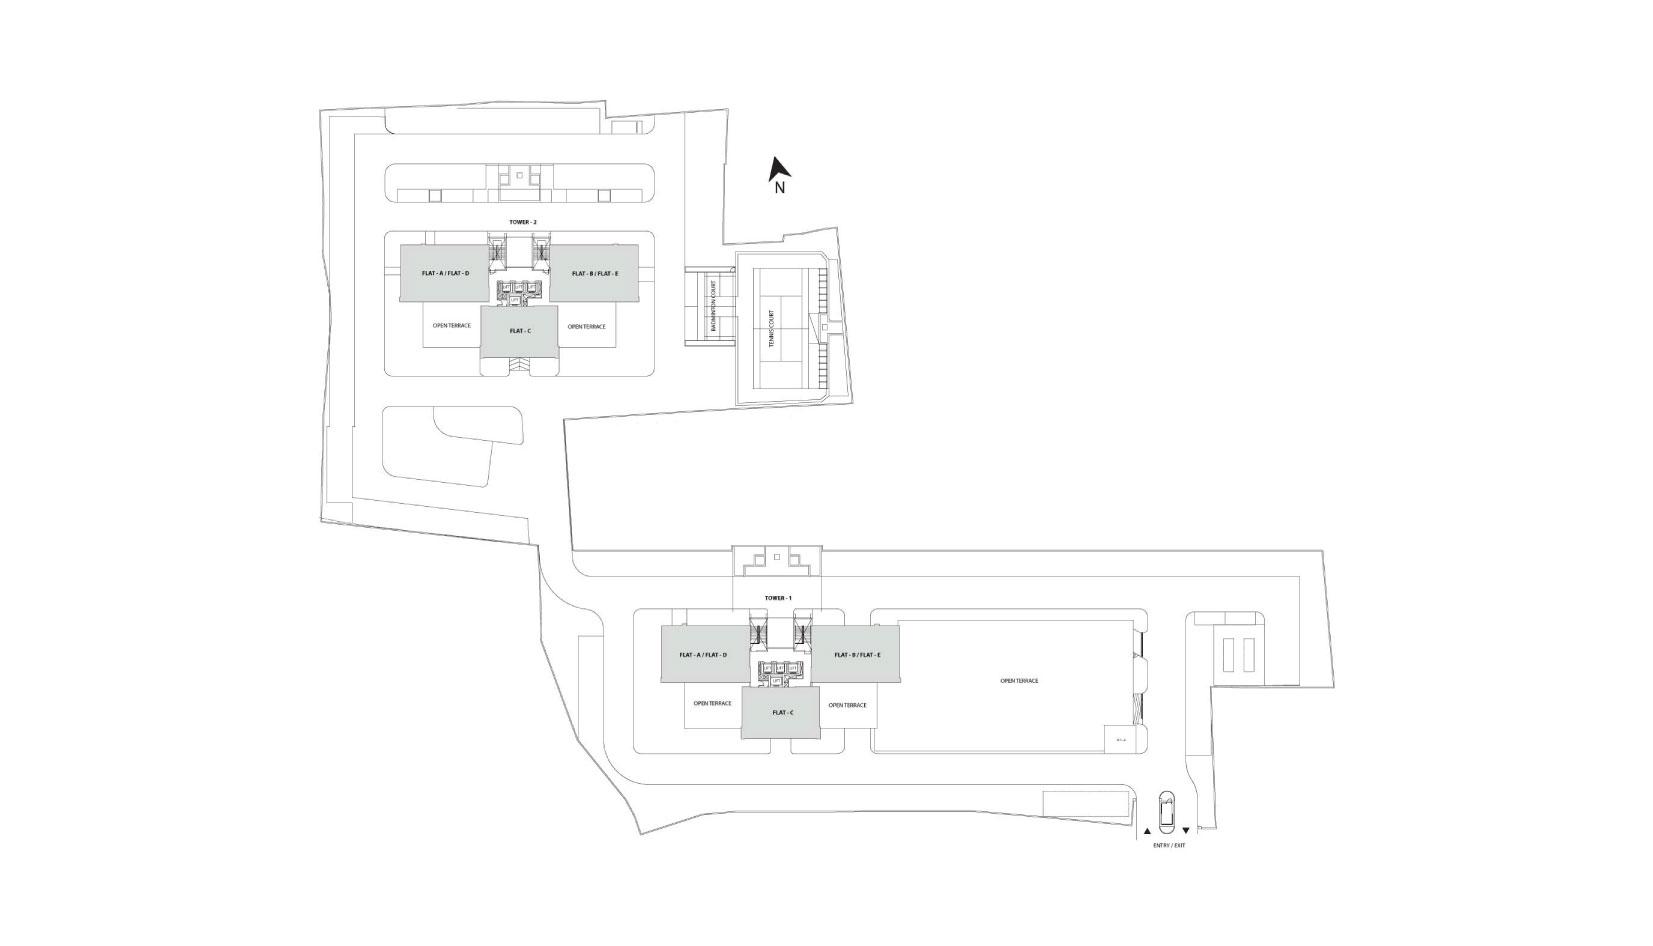 PS-Aurus-Site-Plan